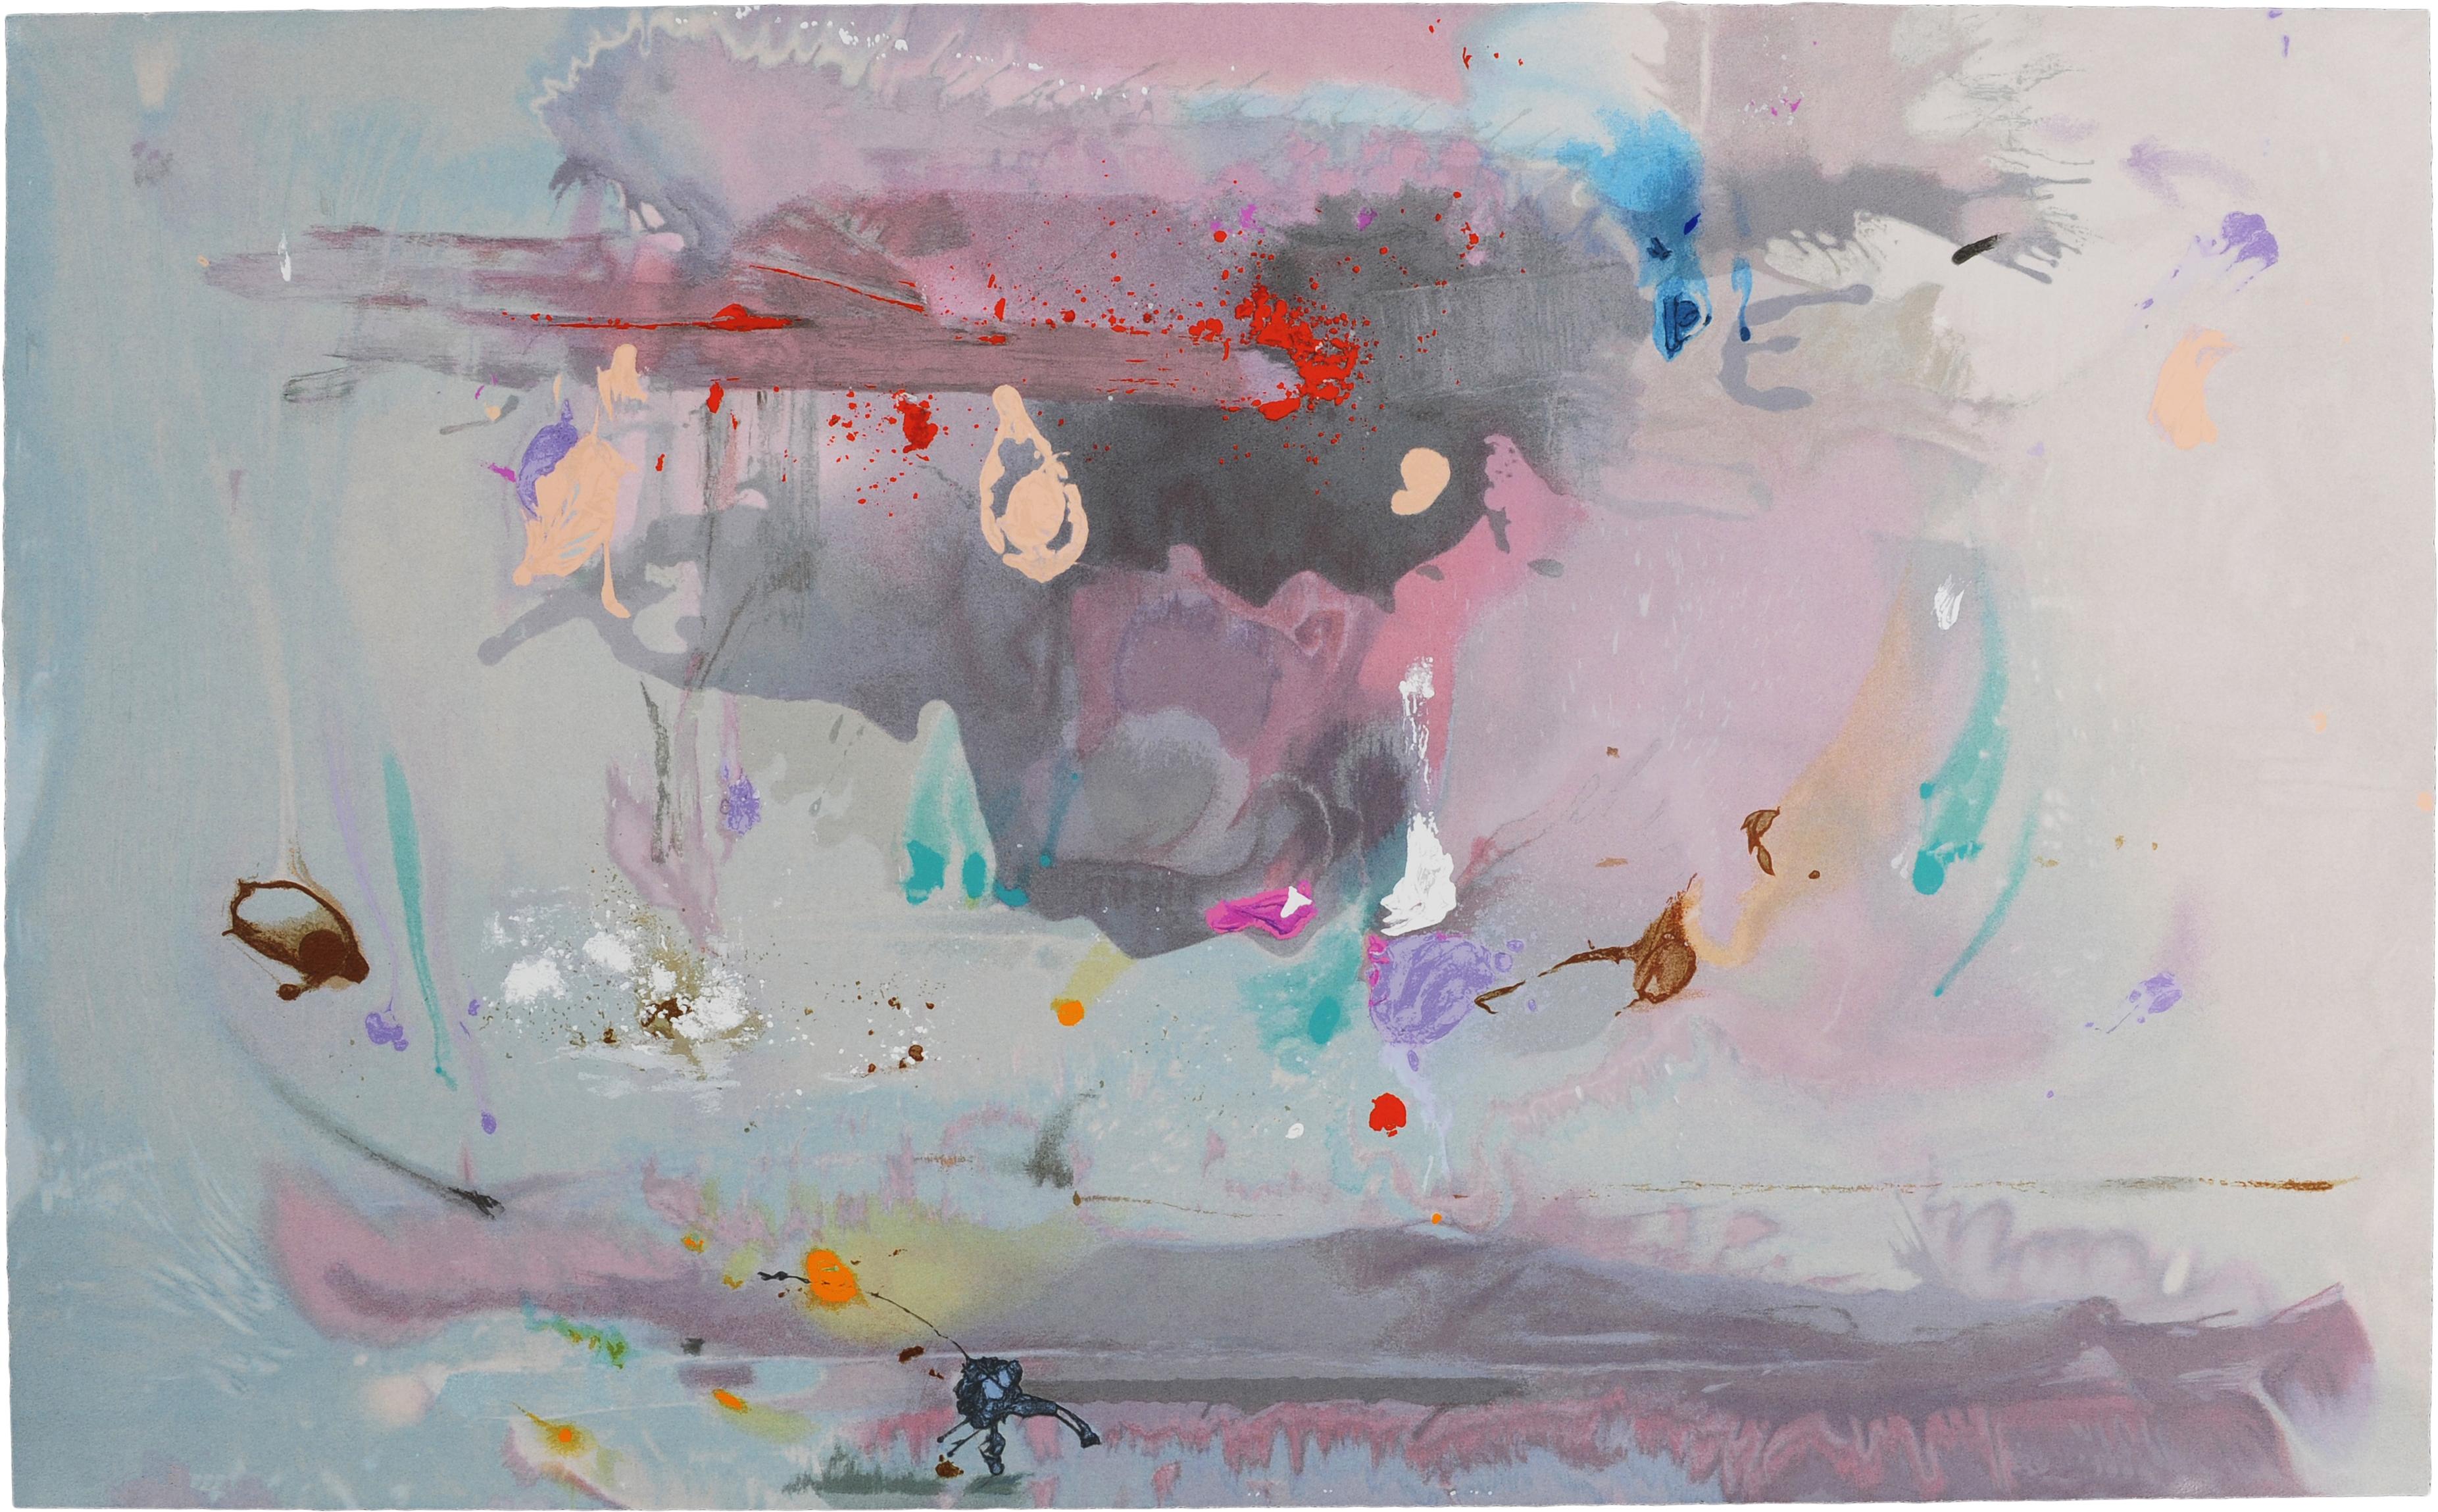 Helen Frankenthaler, Grey Fireworks, 2000.jpg